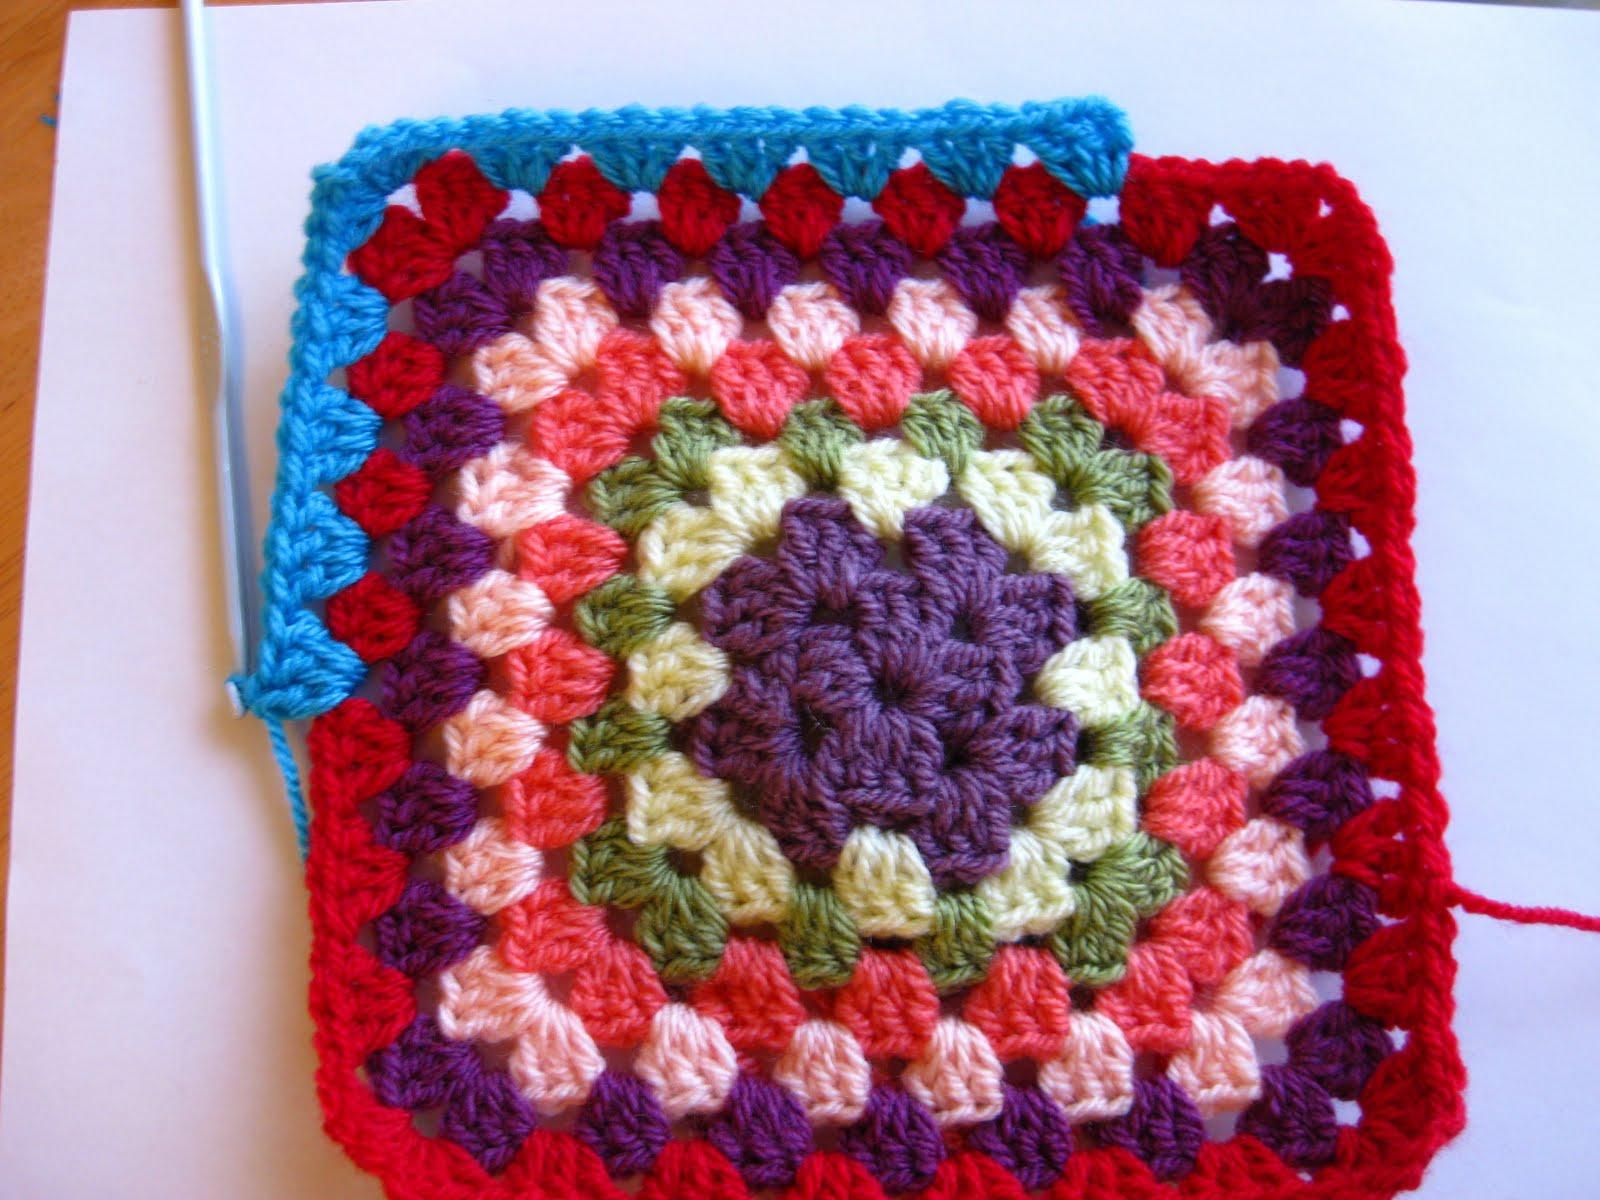 Bunny Mummy How To Crochet A Granny Square